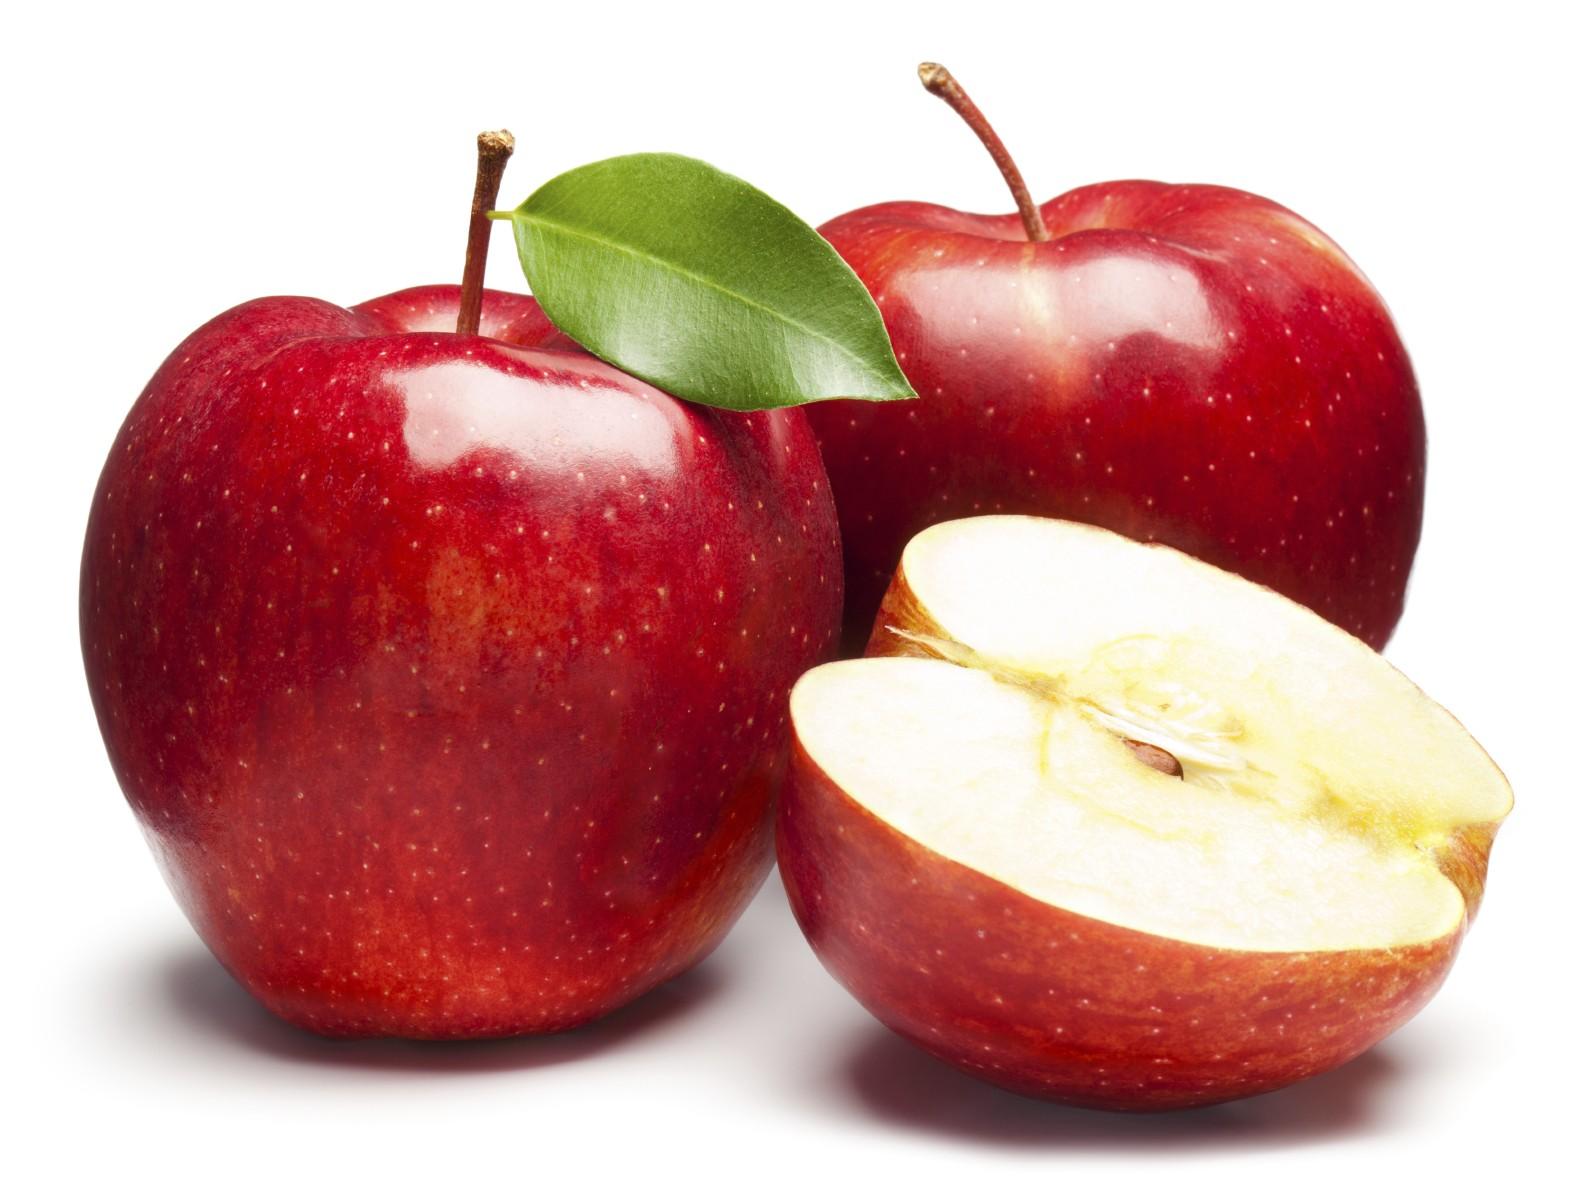 Tips Menyimpan Apel agar Tetap Segar dan Renyah